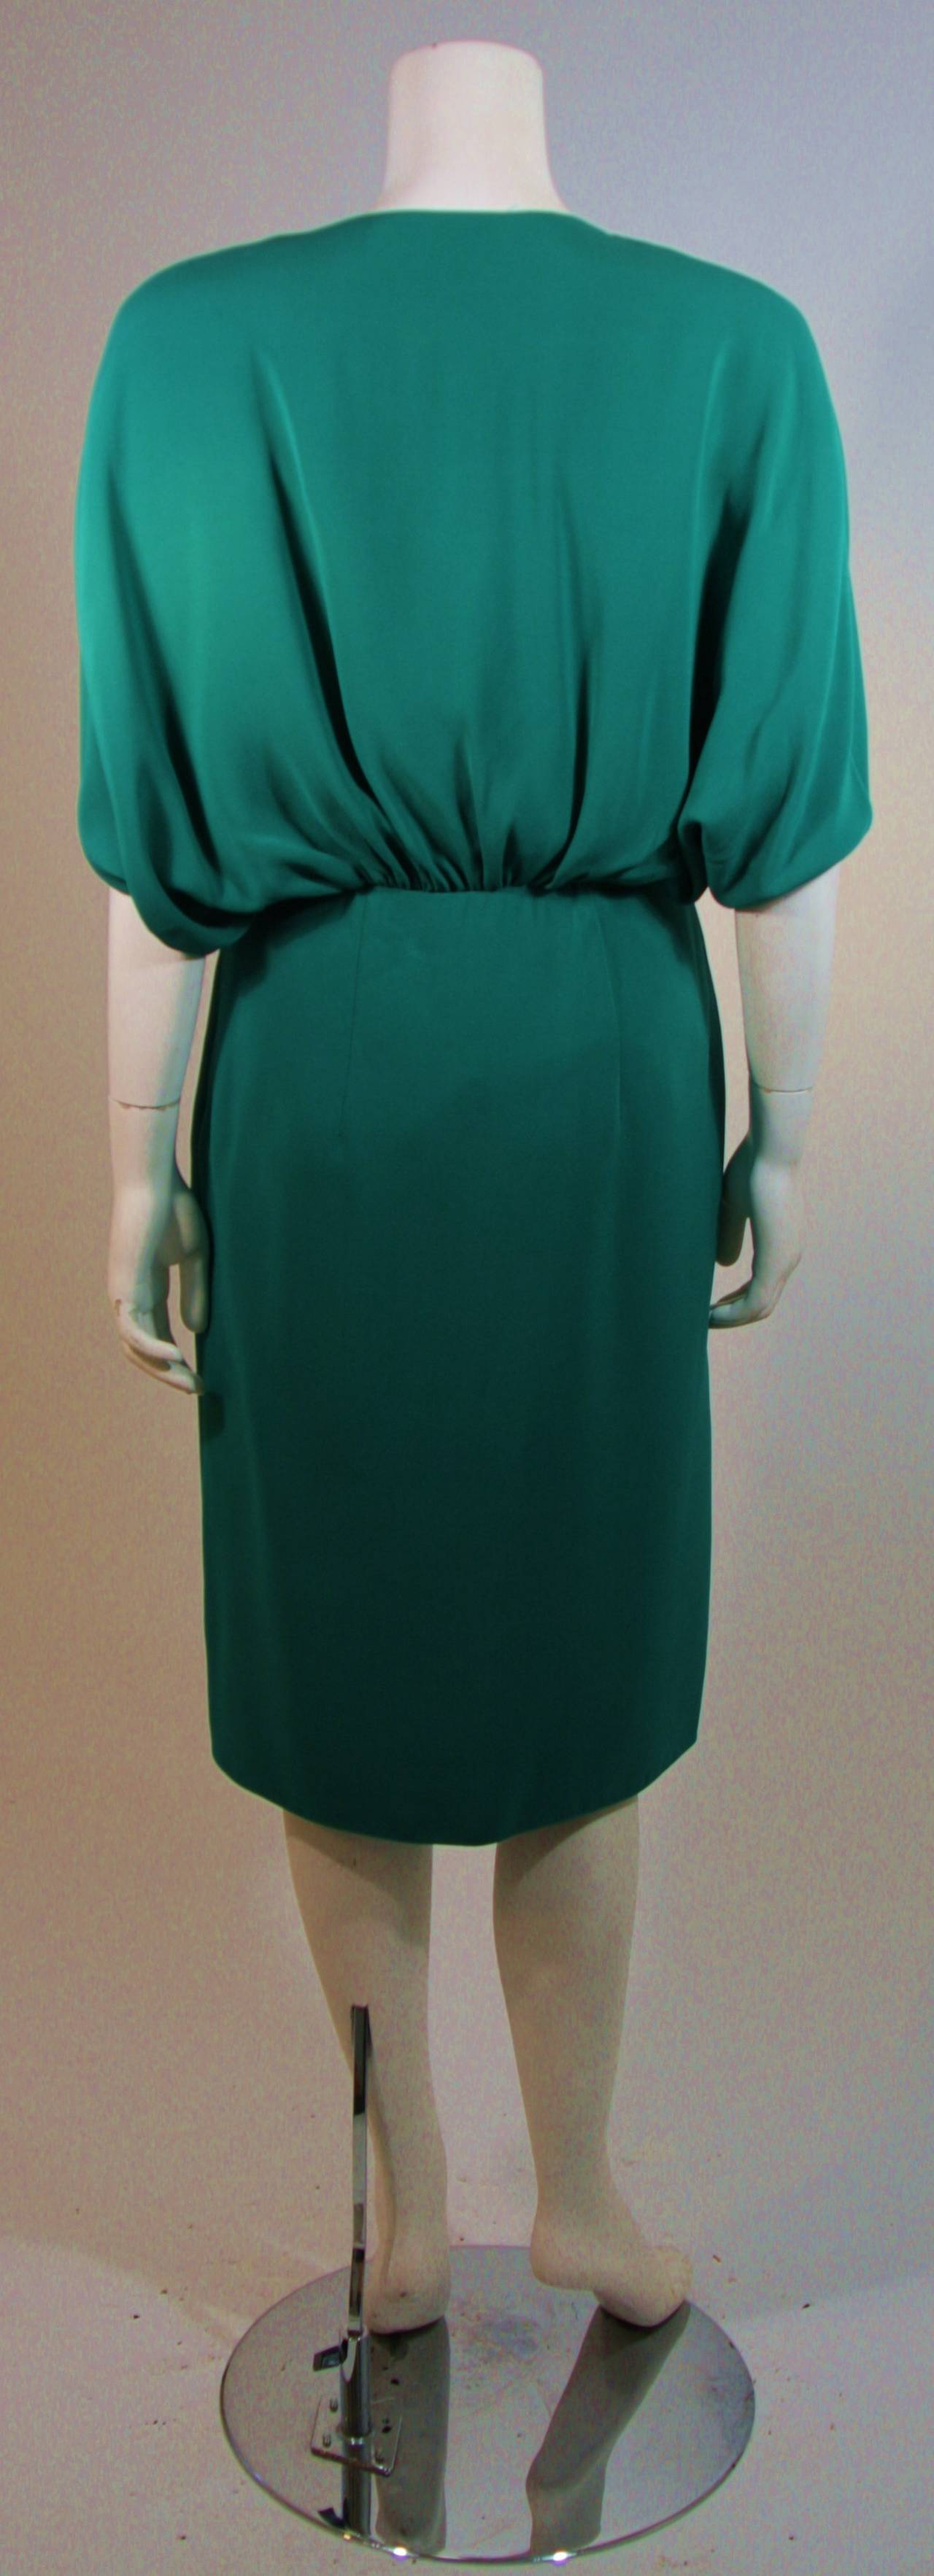 Valentino Green Silk Cocktail Dress with Plunge Neckline Size 8 For Sale 2